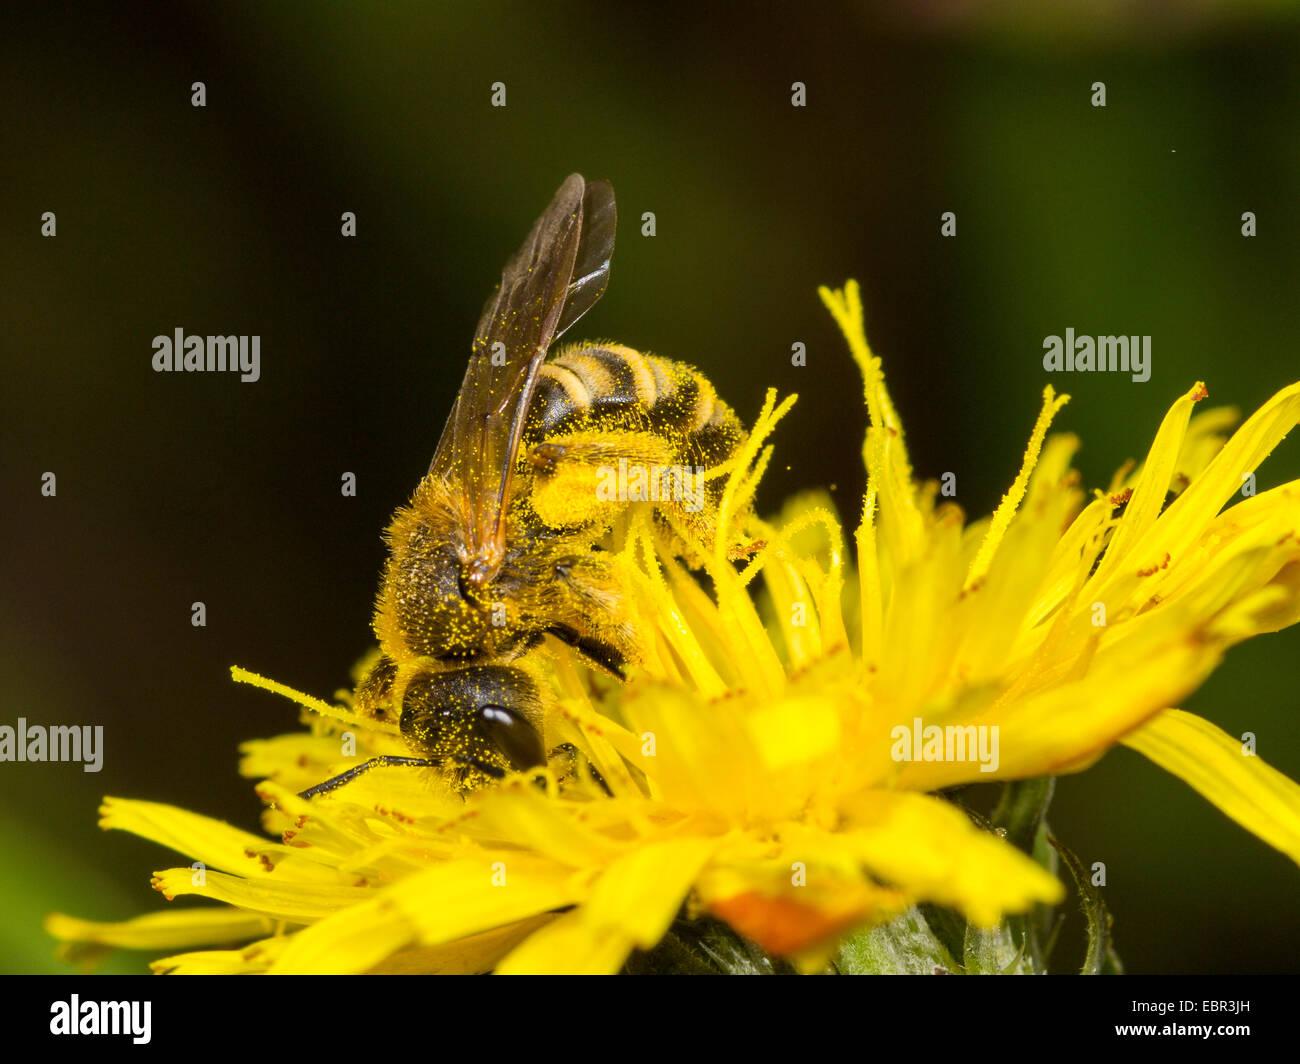 Sweat bee (Halictus scabiosae), female foraging on crepis, Germany - Stock Image